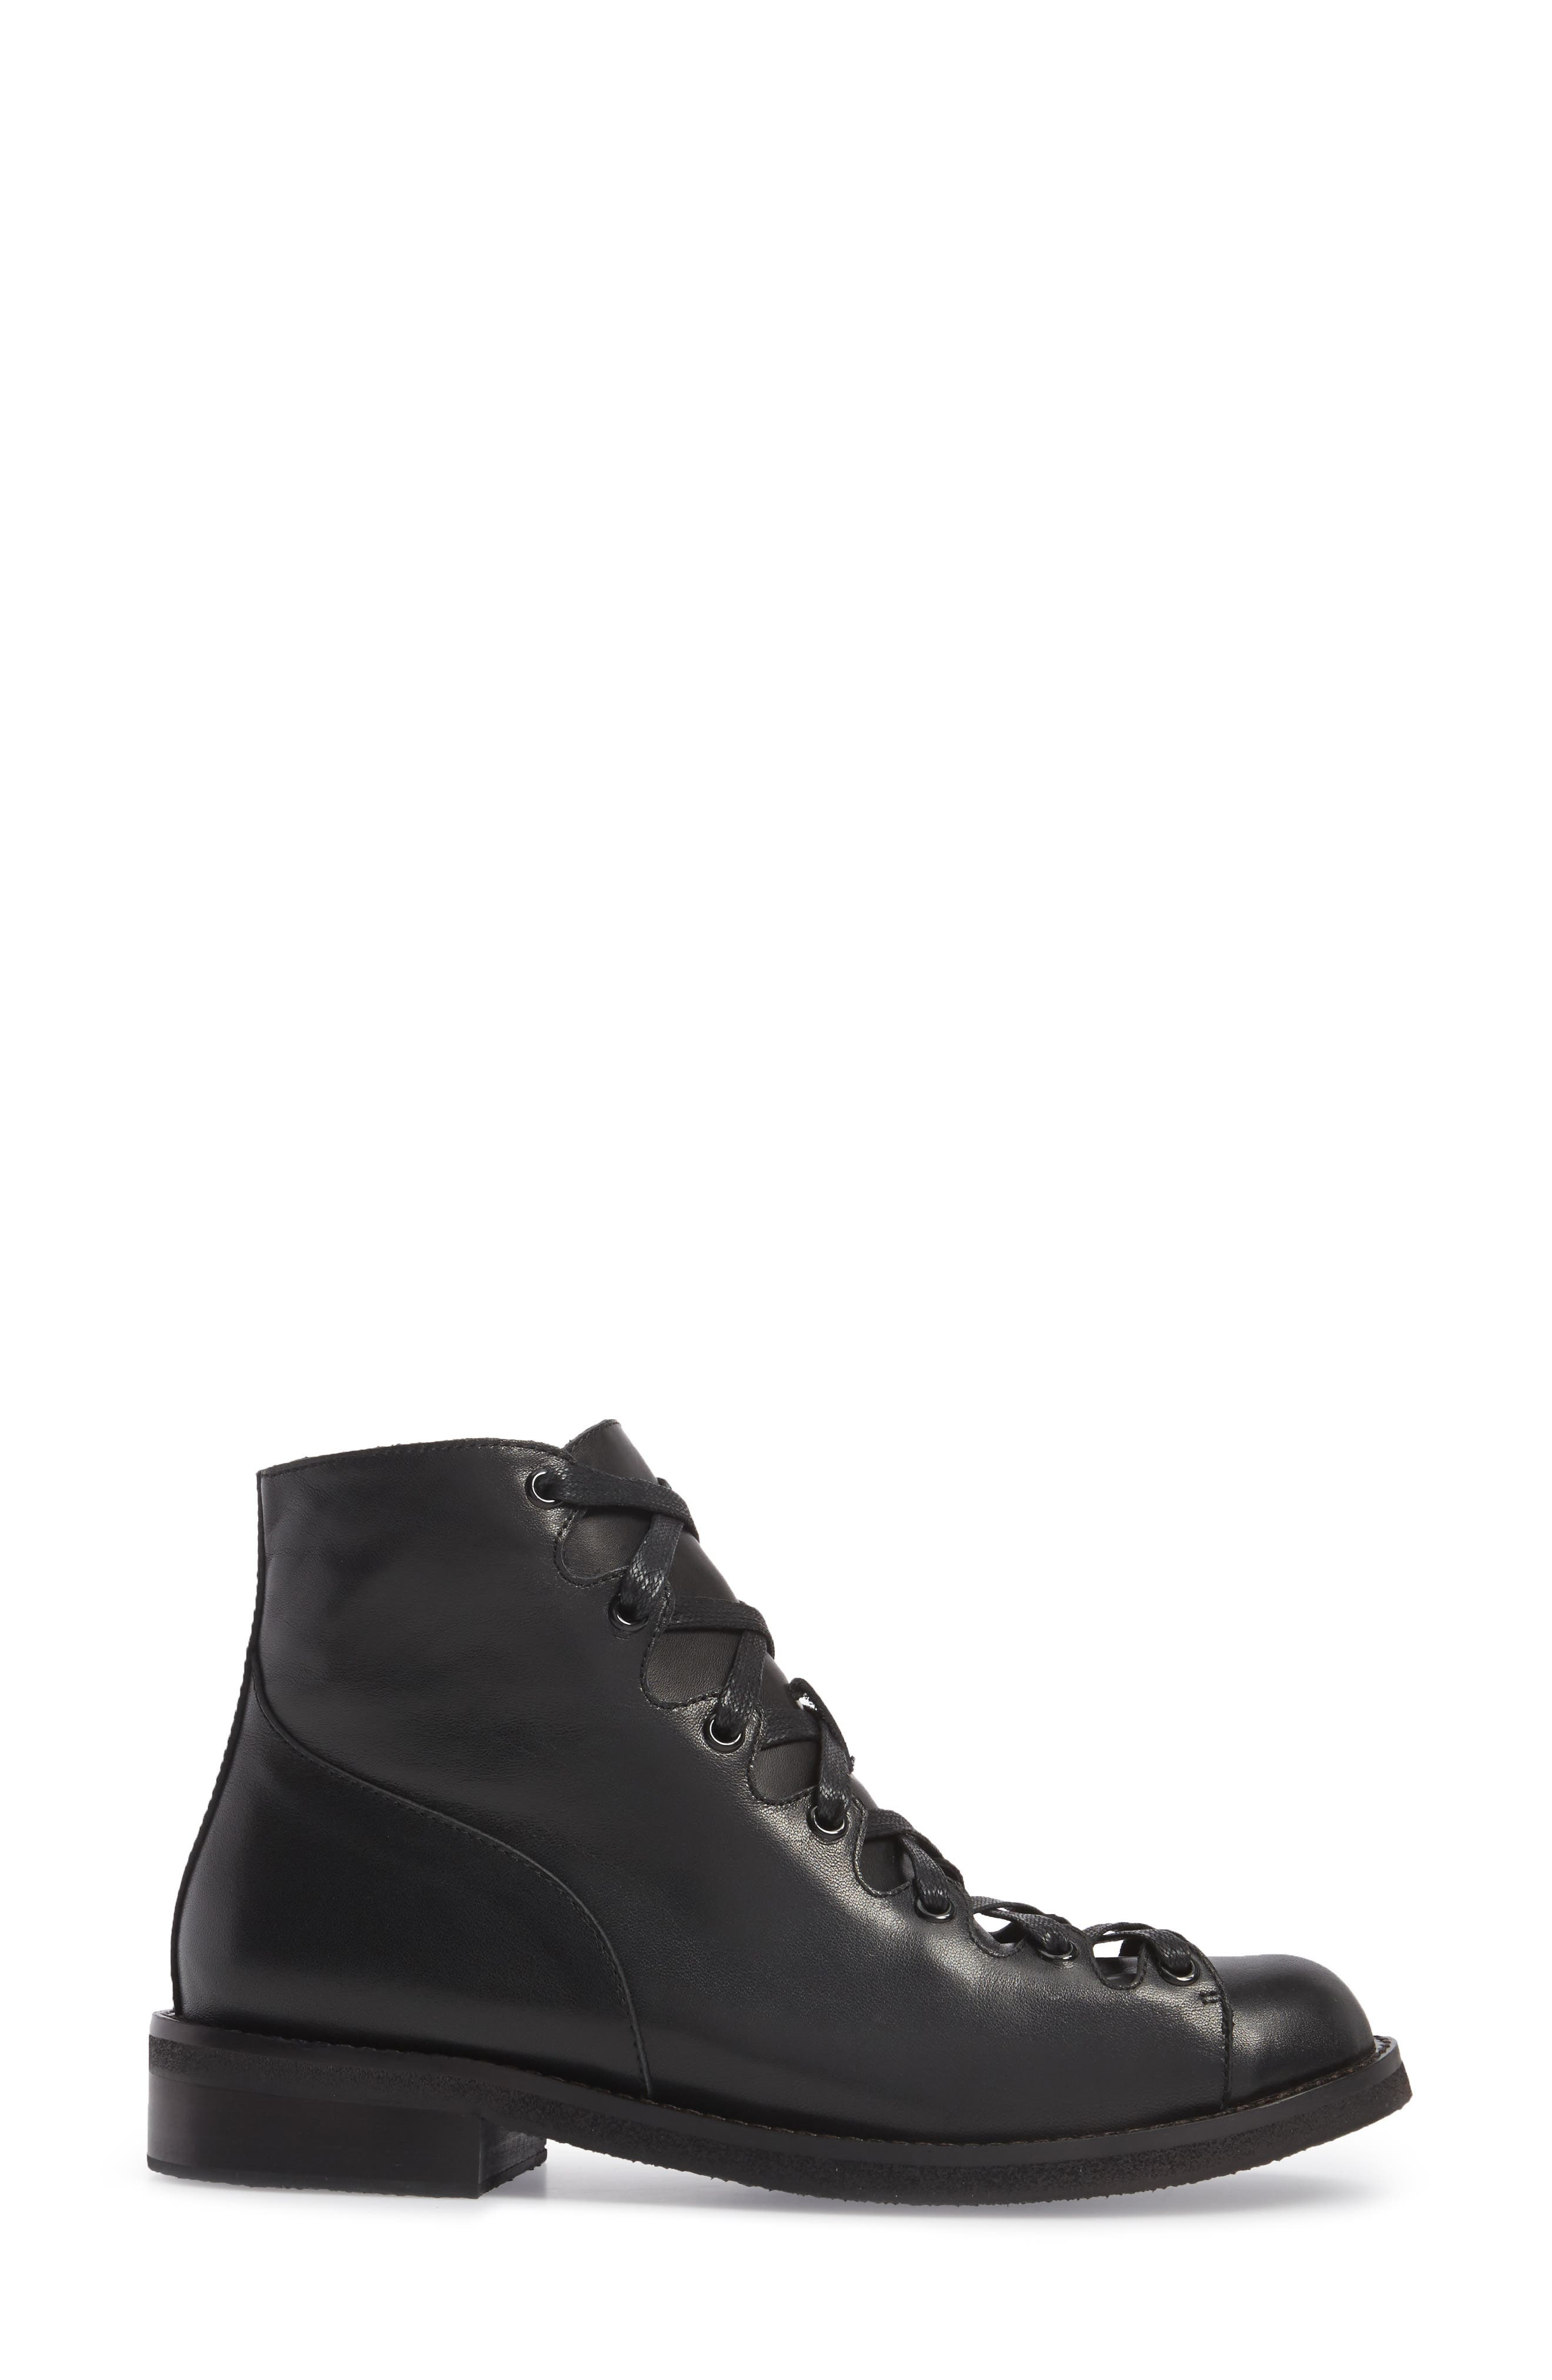 Alternate Image 3  - Grey City Jess Ghillie Combat Boot (Women)